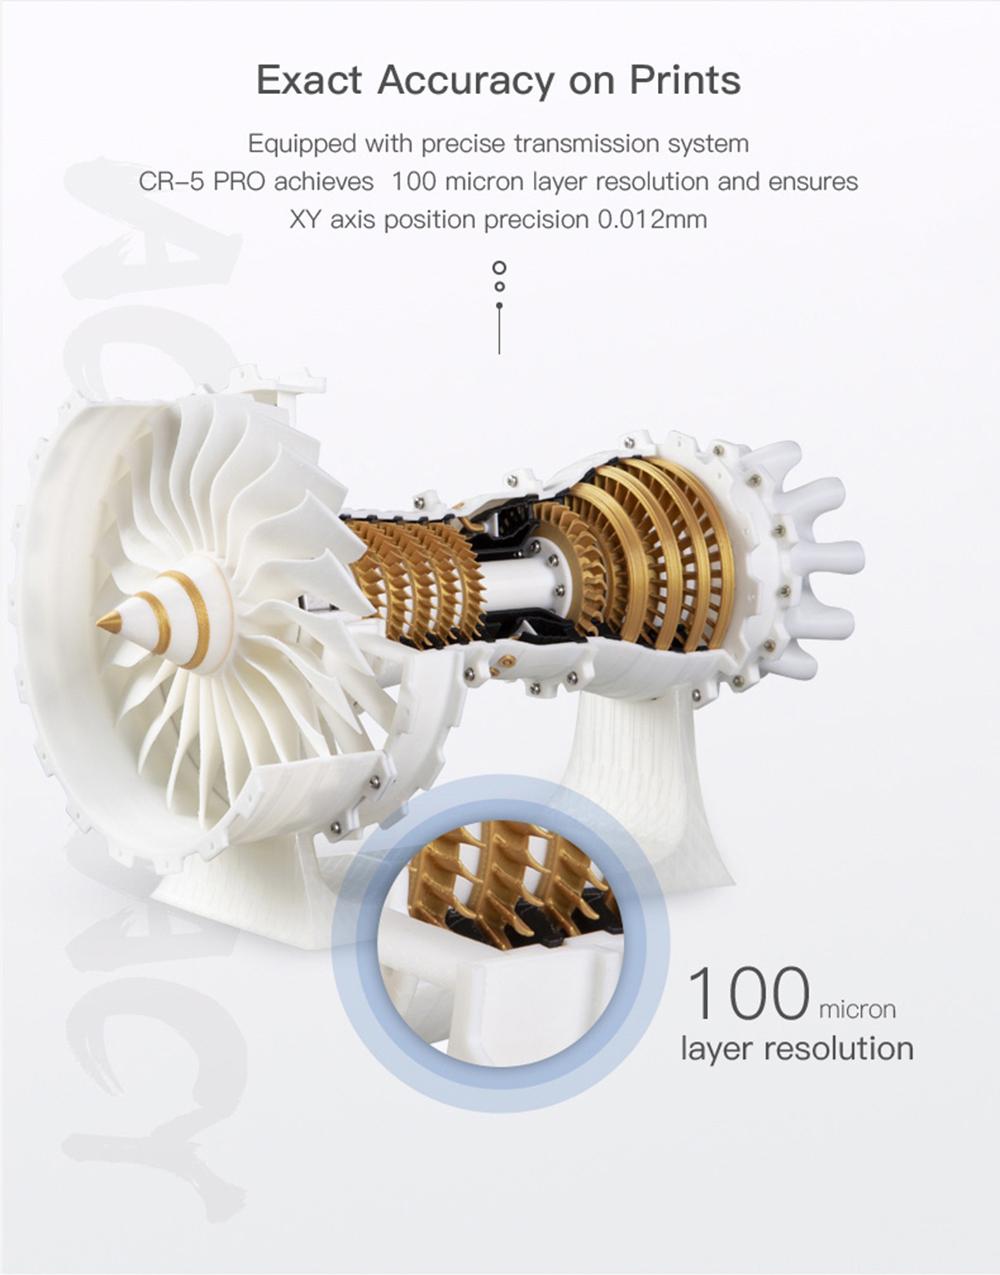 Creality3D CR-5 Pro 3D-Drucker - 300x225x380mm - Sehr hohe Präzision